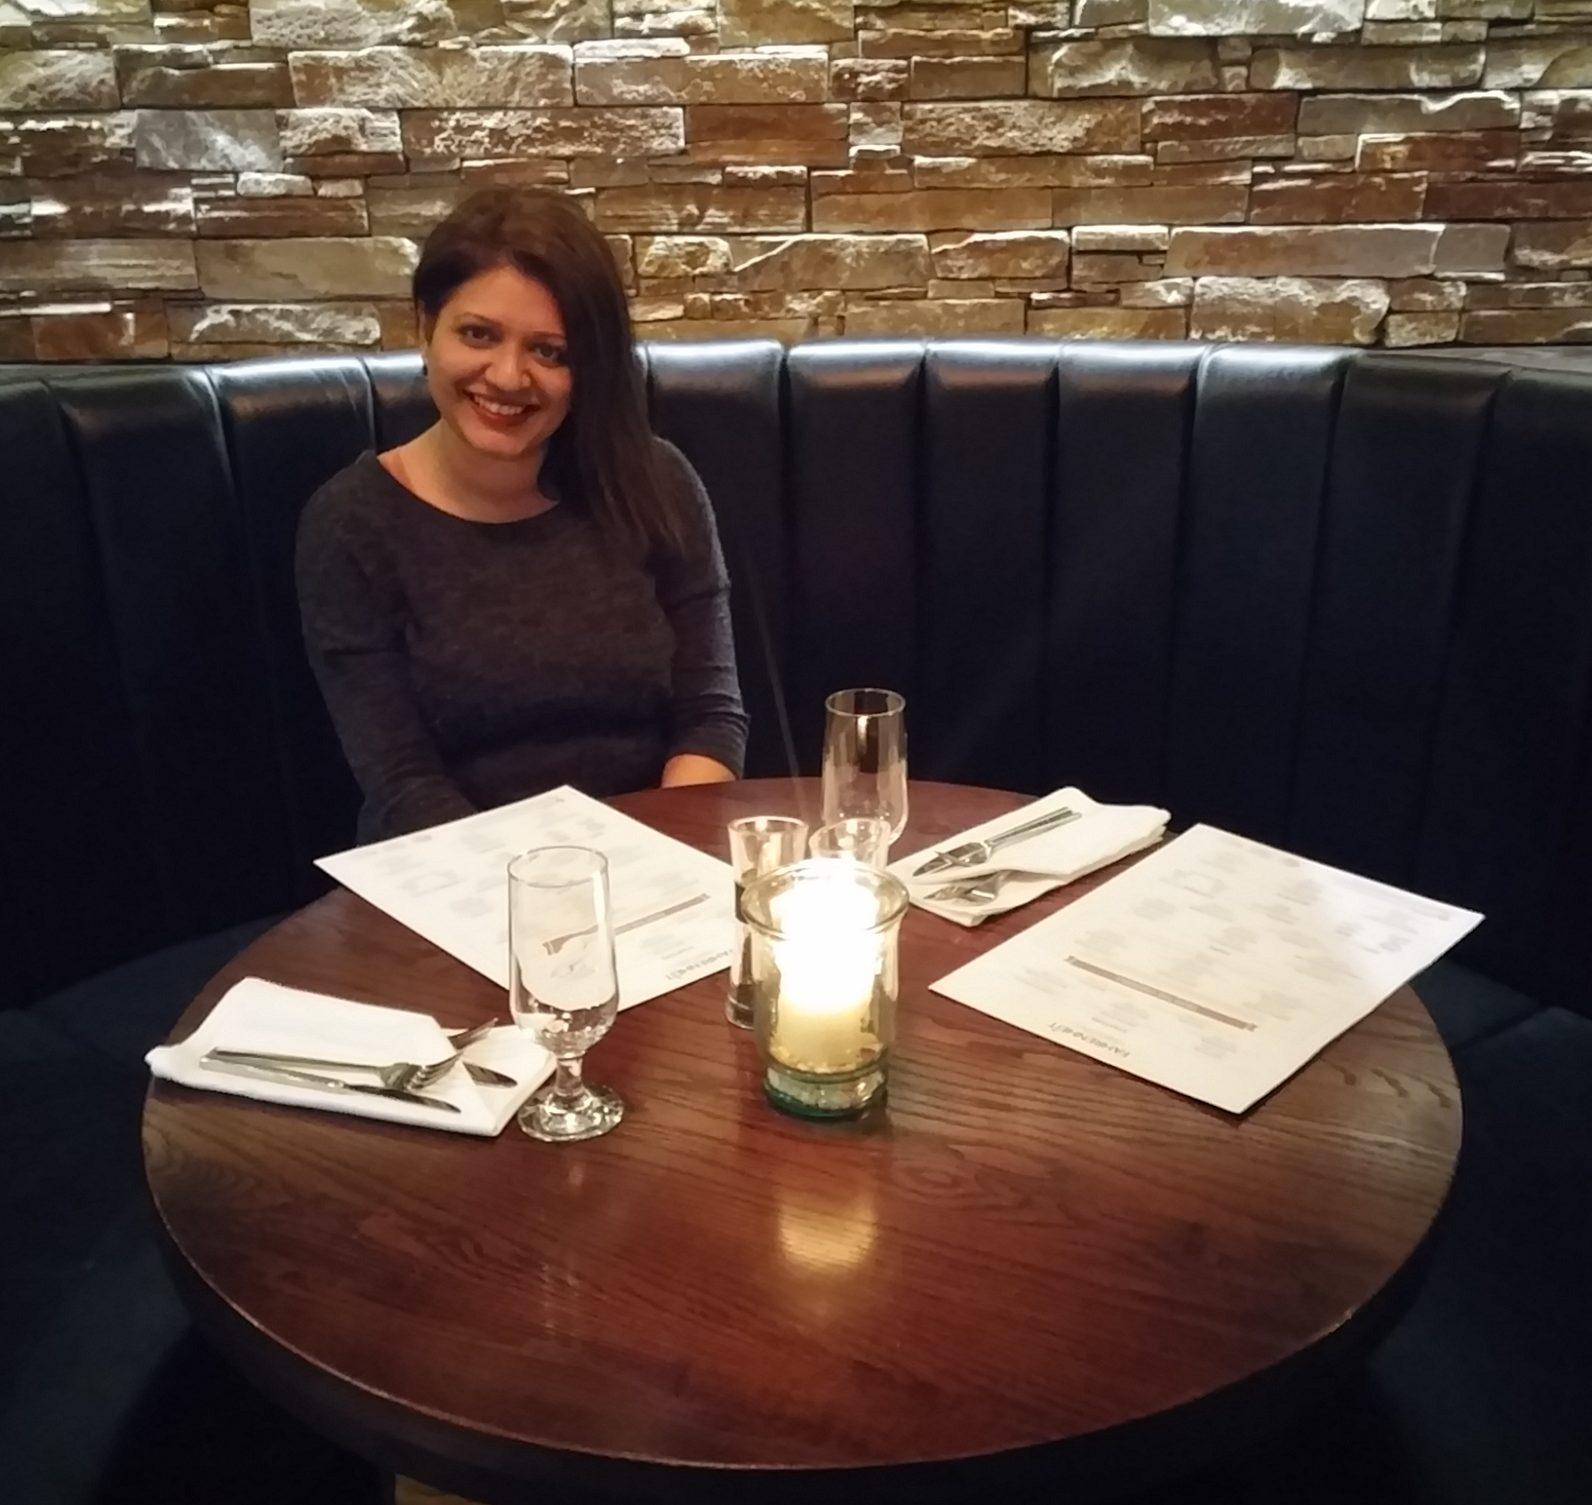 Restaurant review: Fahrenheit Bar & Grill, Derby